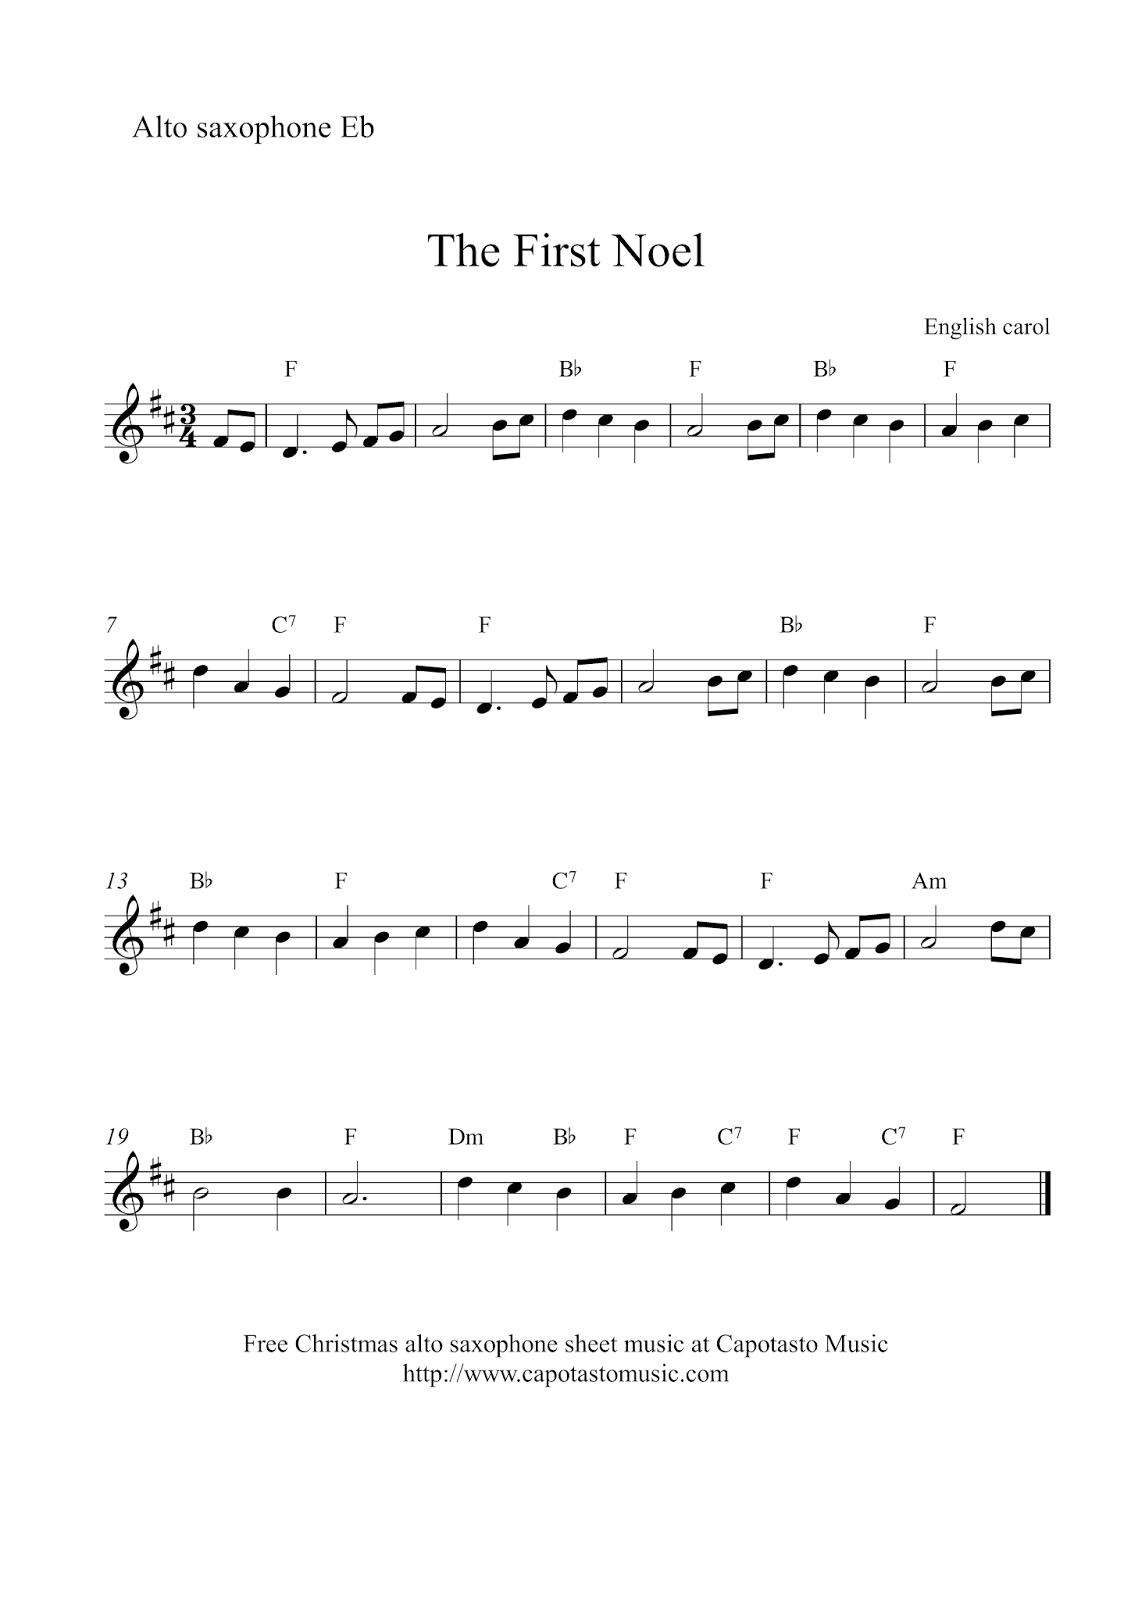 Free Sheet Music Scores: Alto Saxophone Christmas   Xmas Music - Free Printable Sheet Music For Trumpet